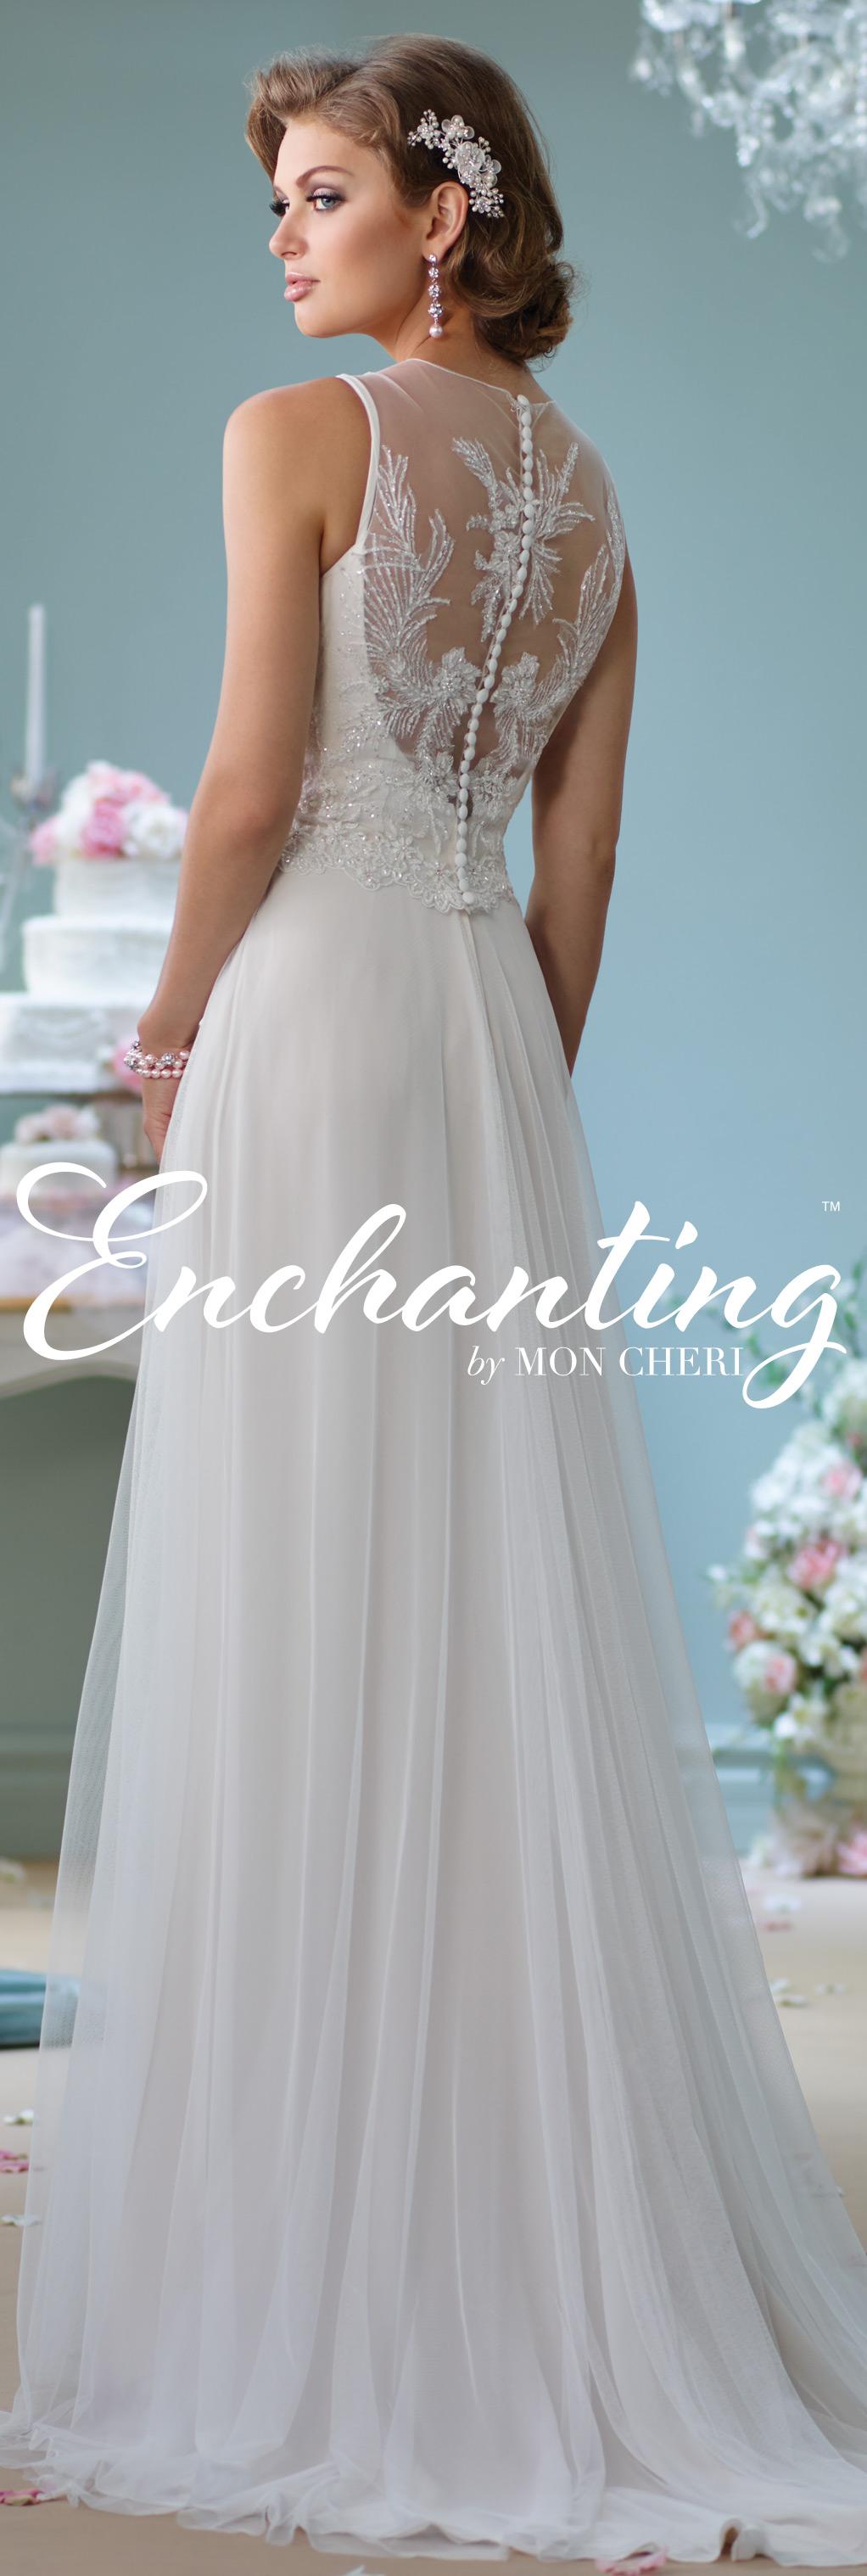 Modern wedding dresses by mon cheri novios vestidos novia y